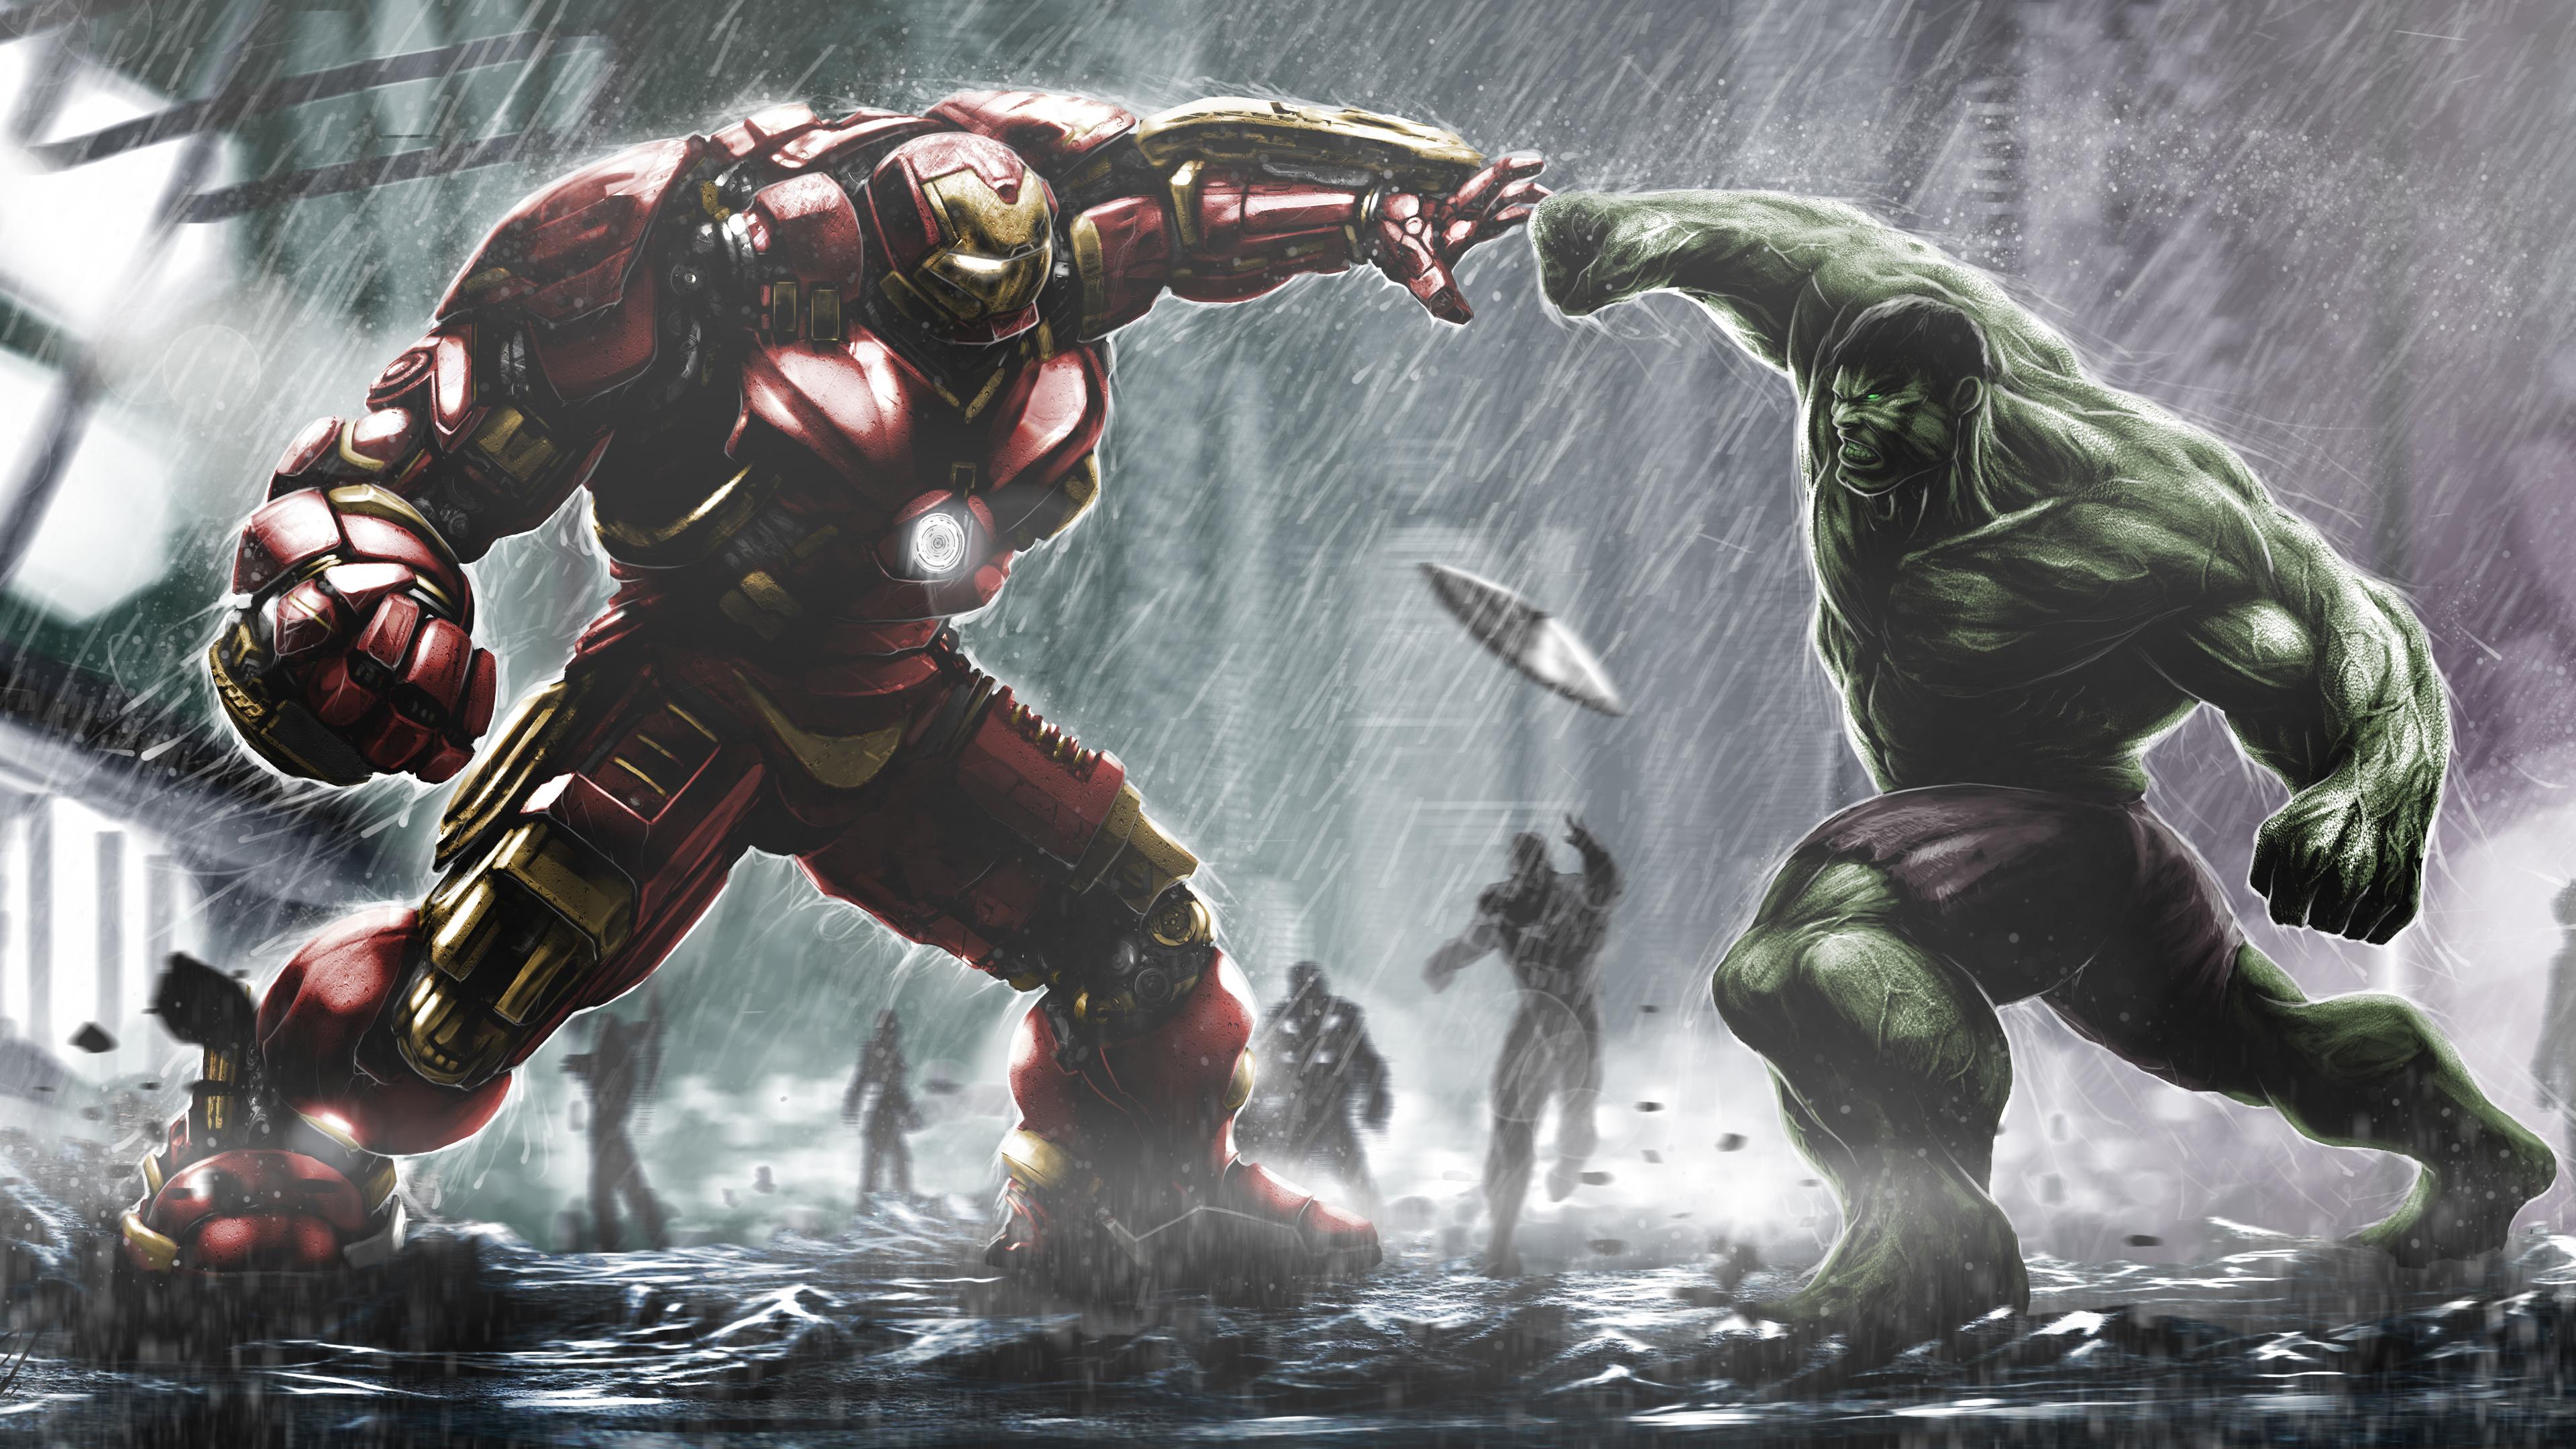 Hulkbuster Ironman Vs Hulk Wallpapers HD Wallpapers 3840x2160